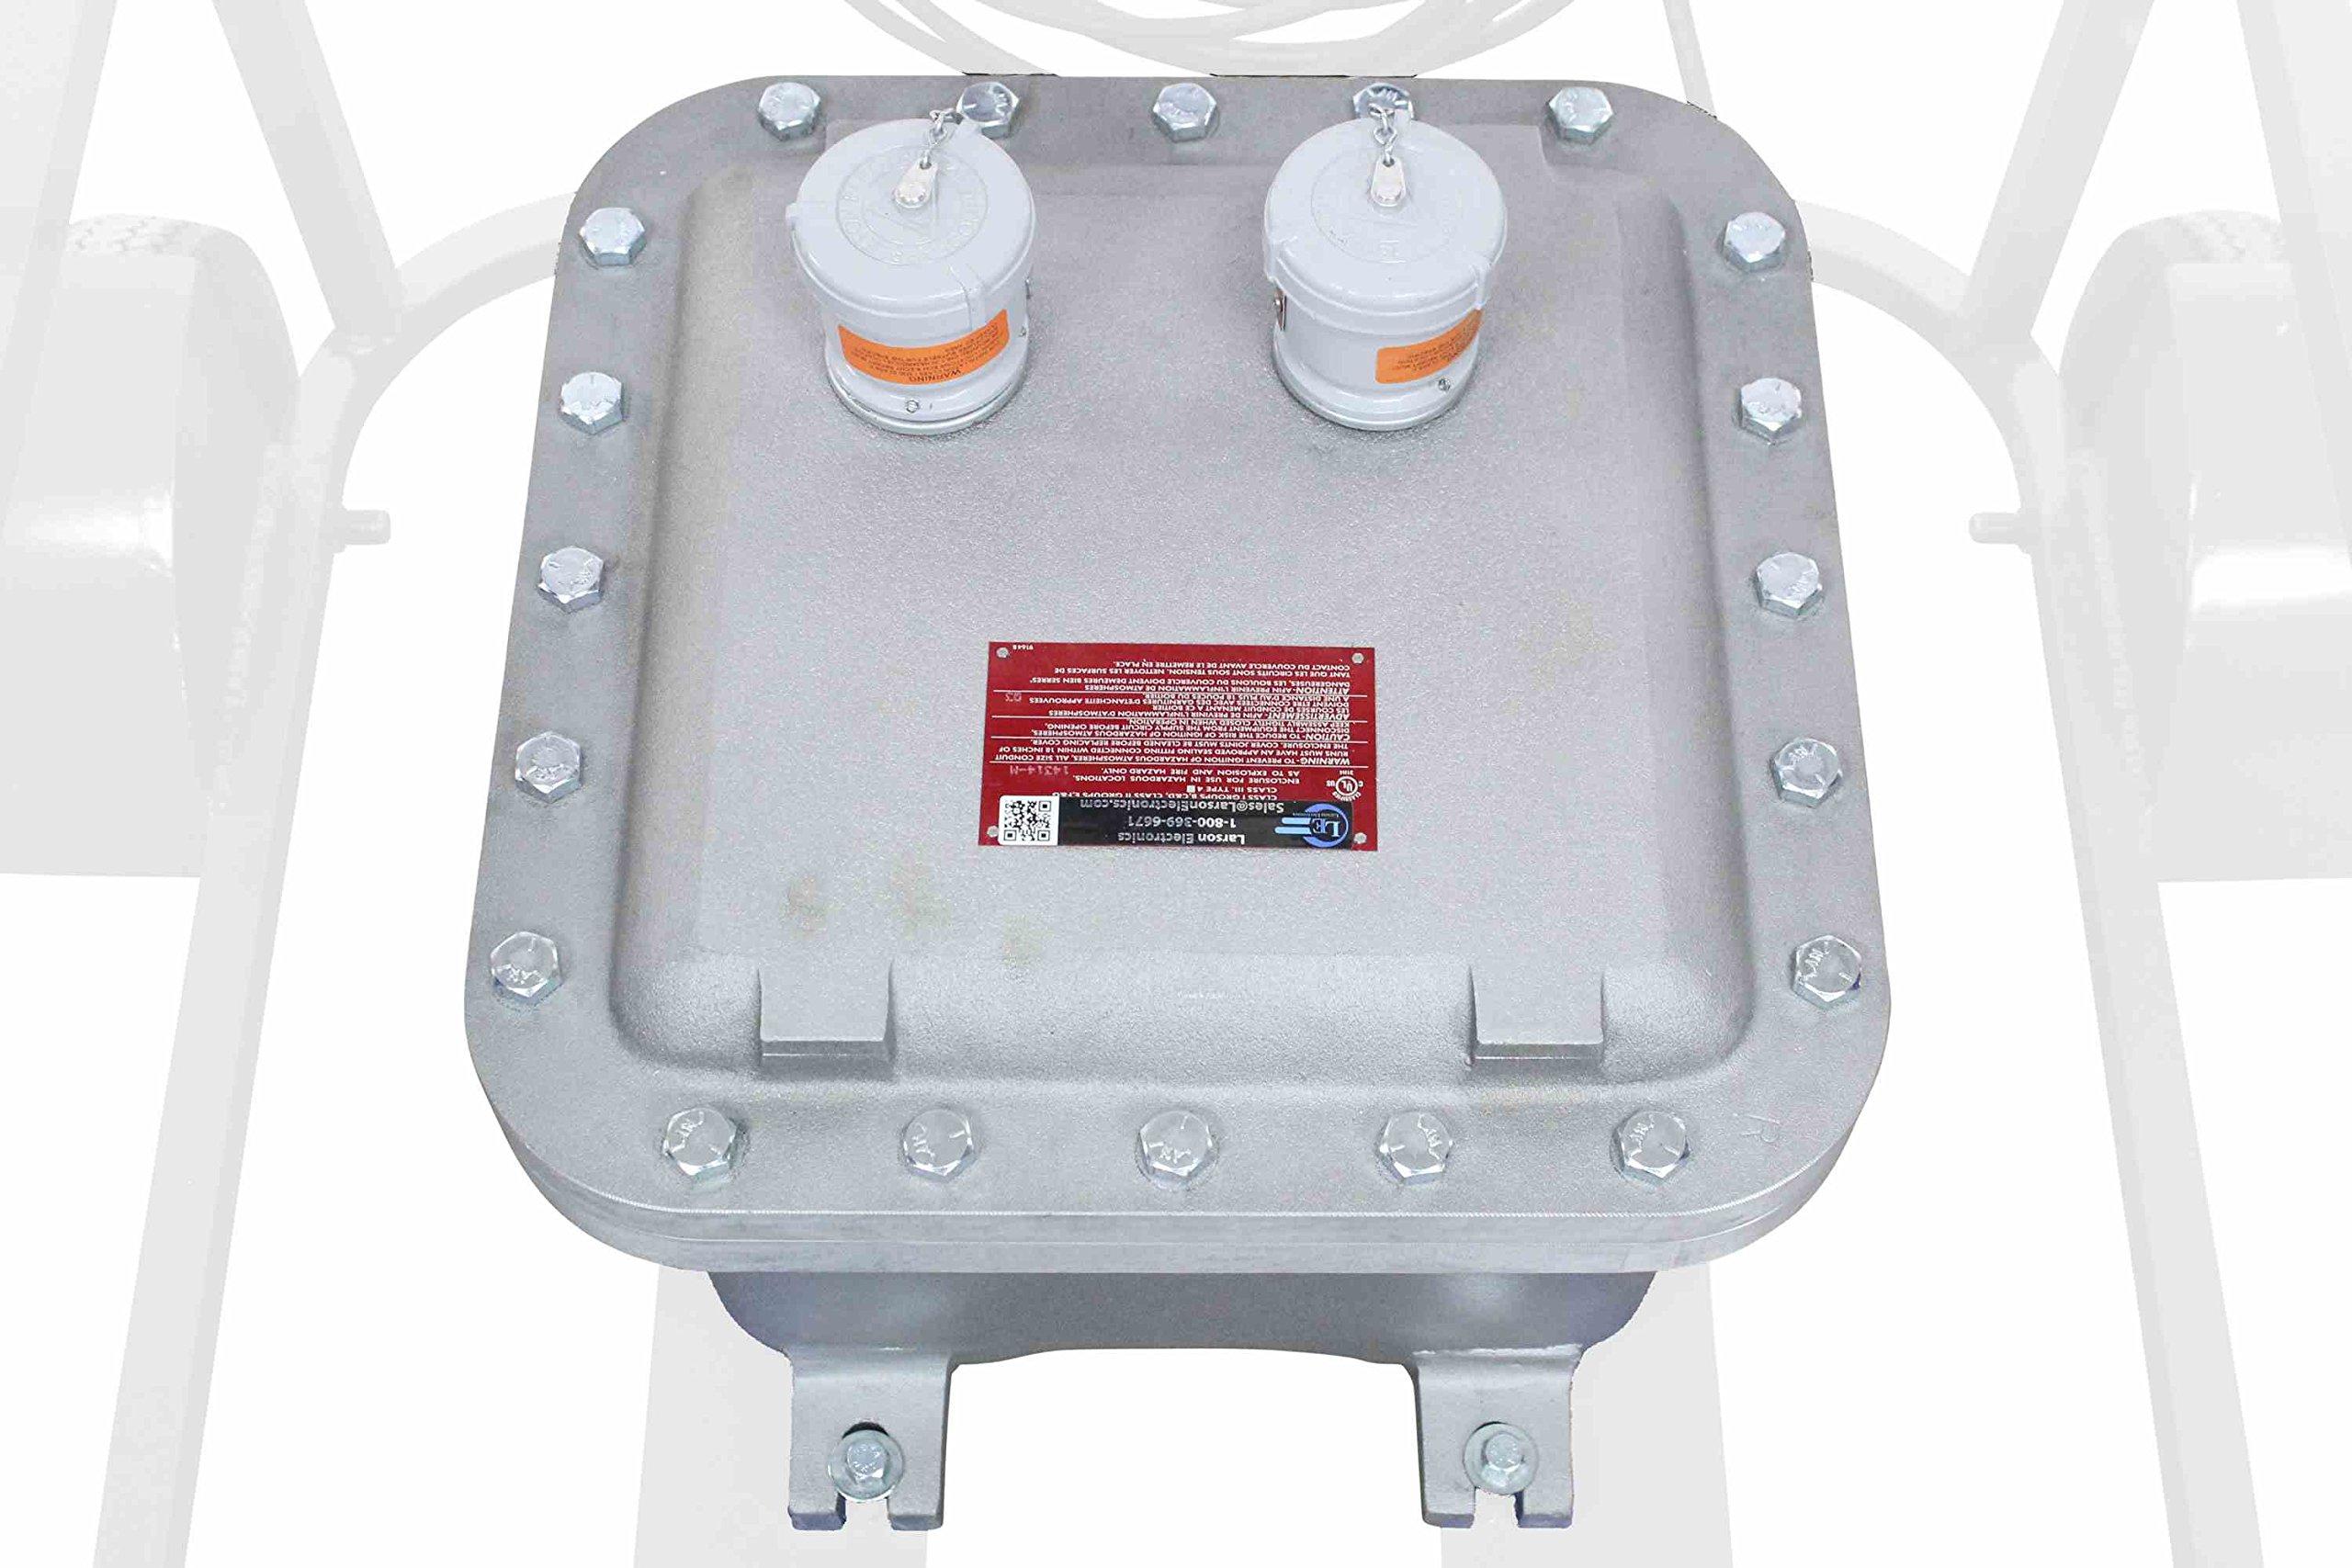 Larson Electronics 0321OXBN74G Explosion Proof LED Light - 70W LED - Quadpod Mount - 100' Soow Cord - Hazlo Plug (24Vdc)